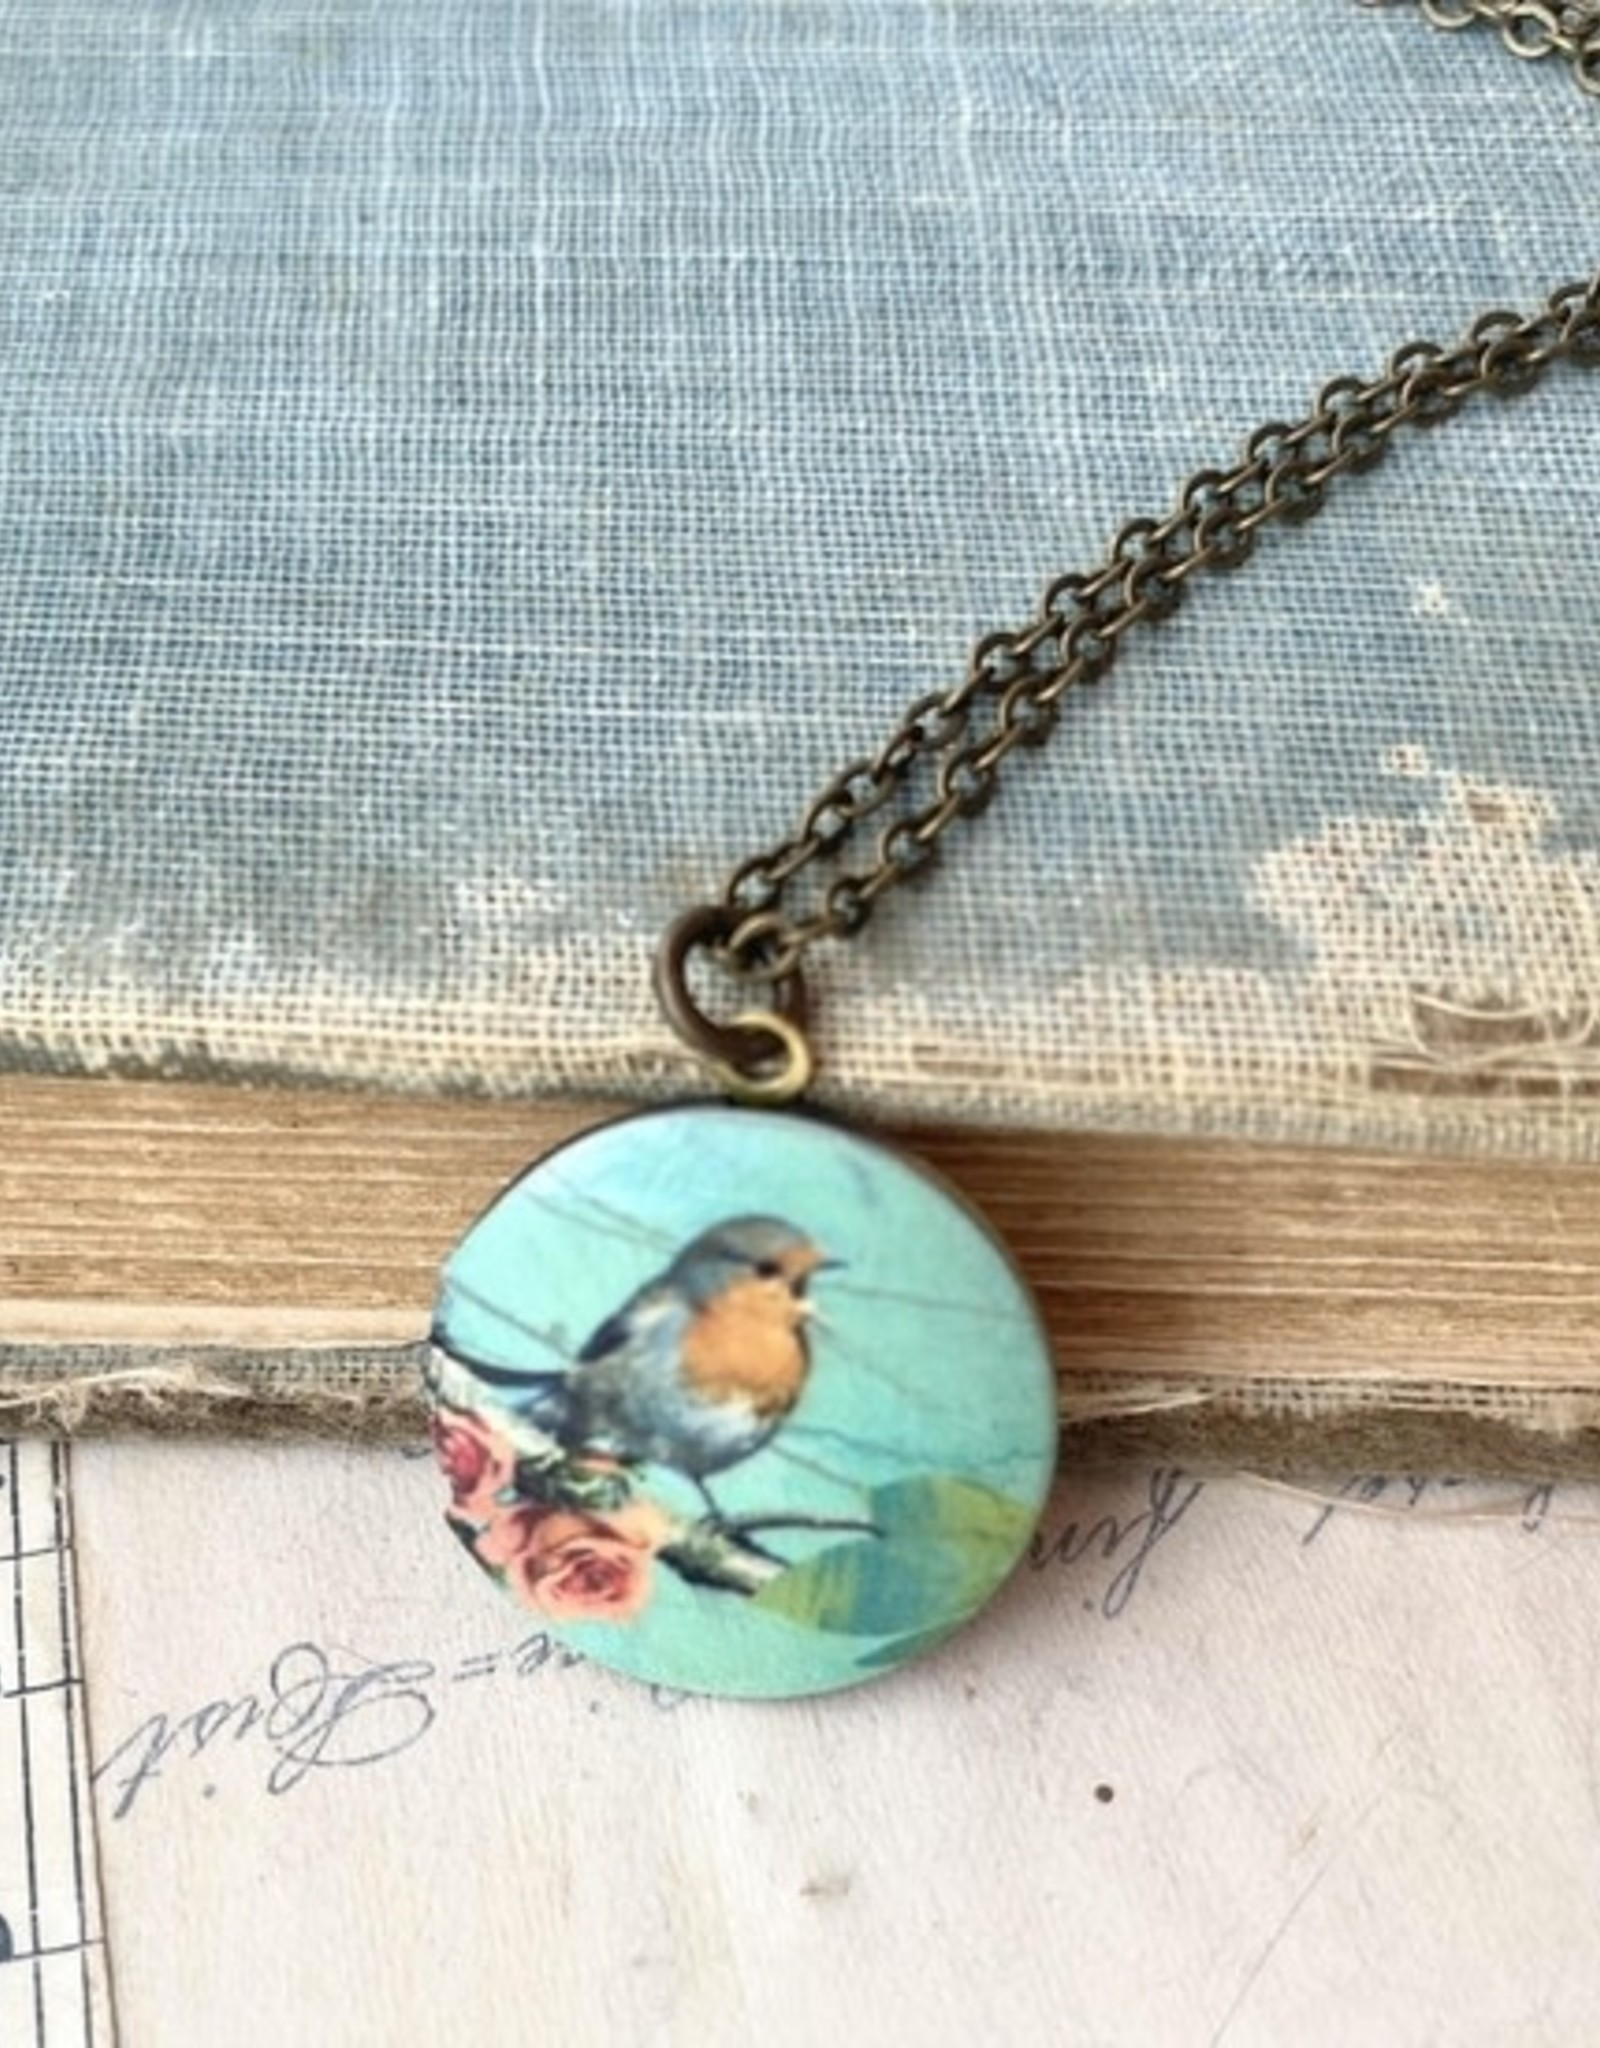 NECKLACE-LOCKET-LITTLE BLUE BIRD, PETITE